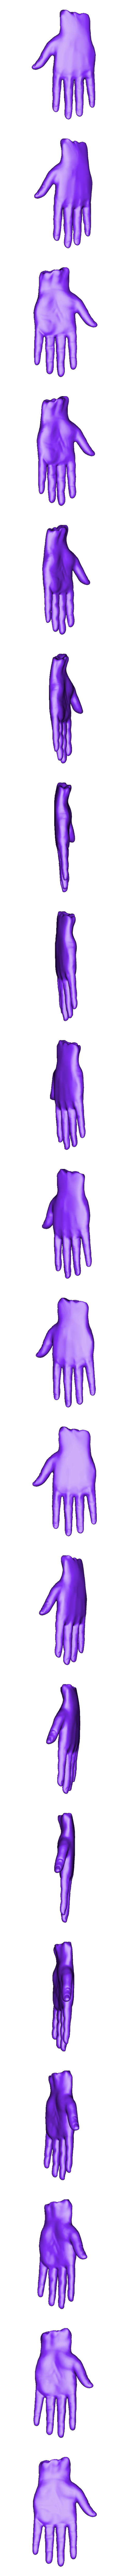 dismemberedhandV2-corrected.stl Download free STL file Dismembered Hand [Halloween] • 3D print object, Piggie